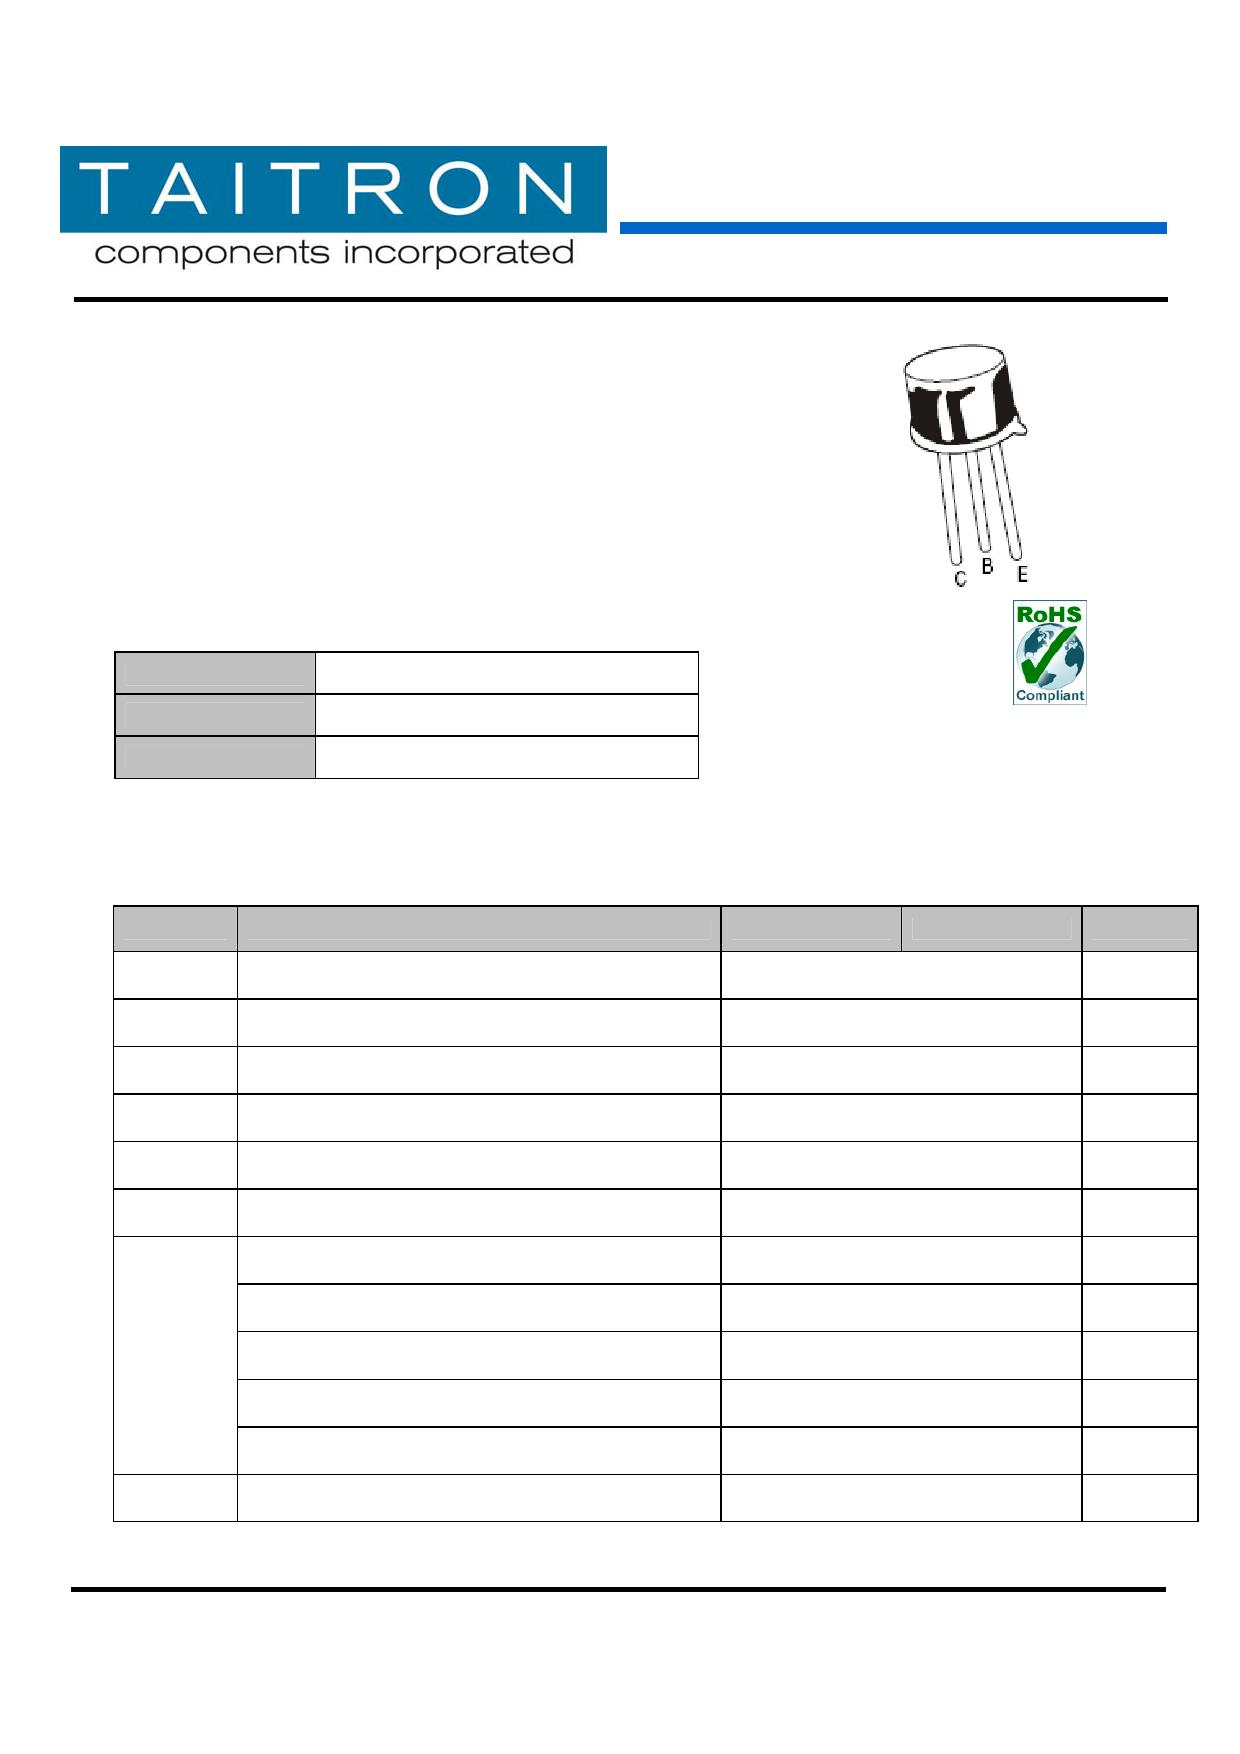 2N2369A 데이터시트 및 2N2369A PDF